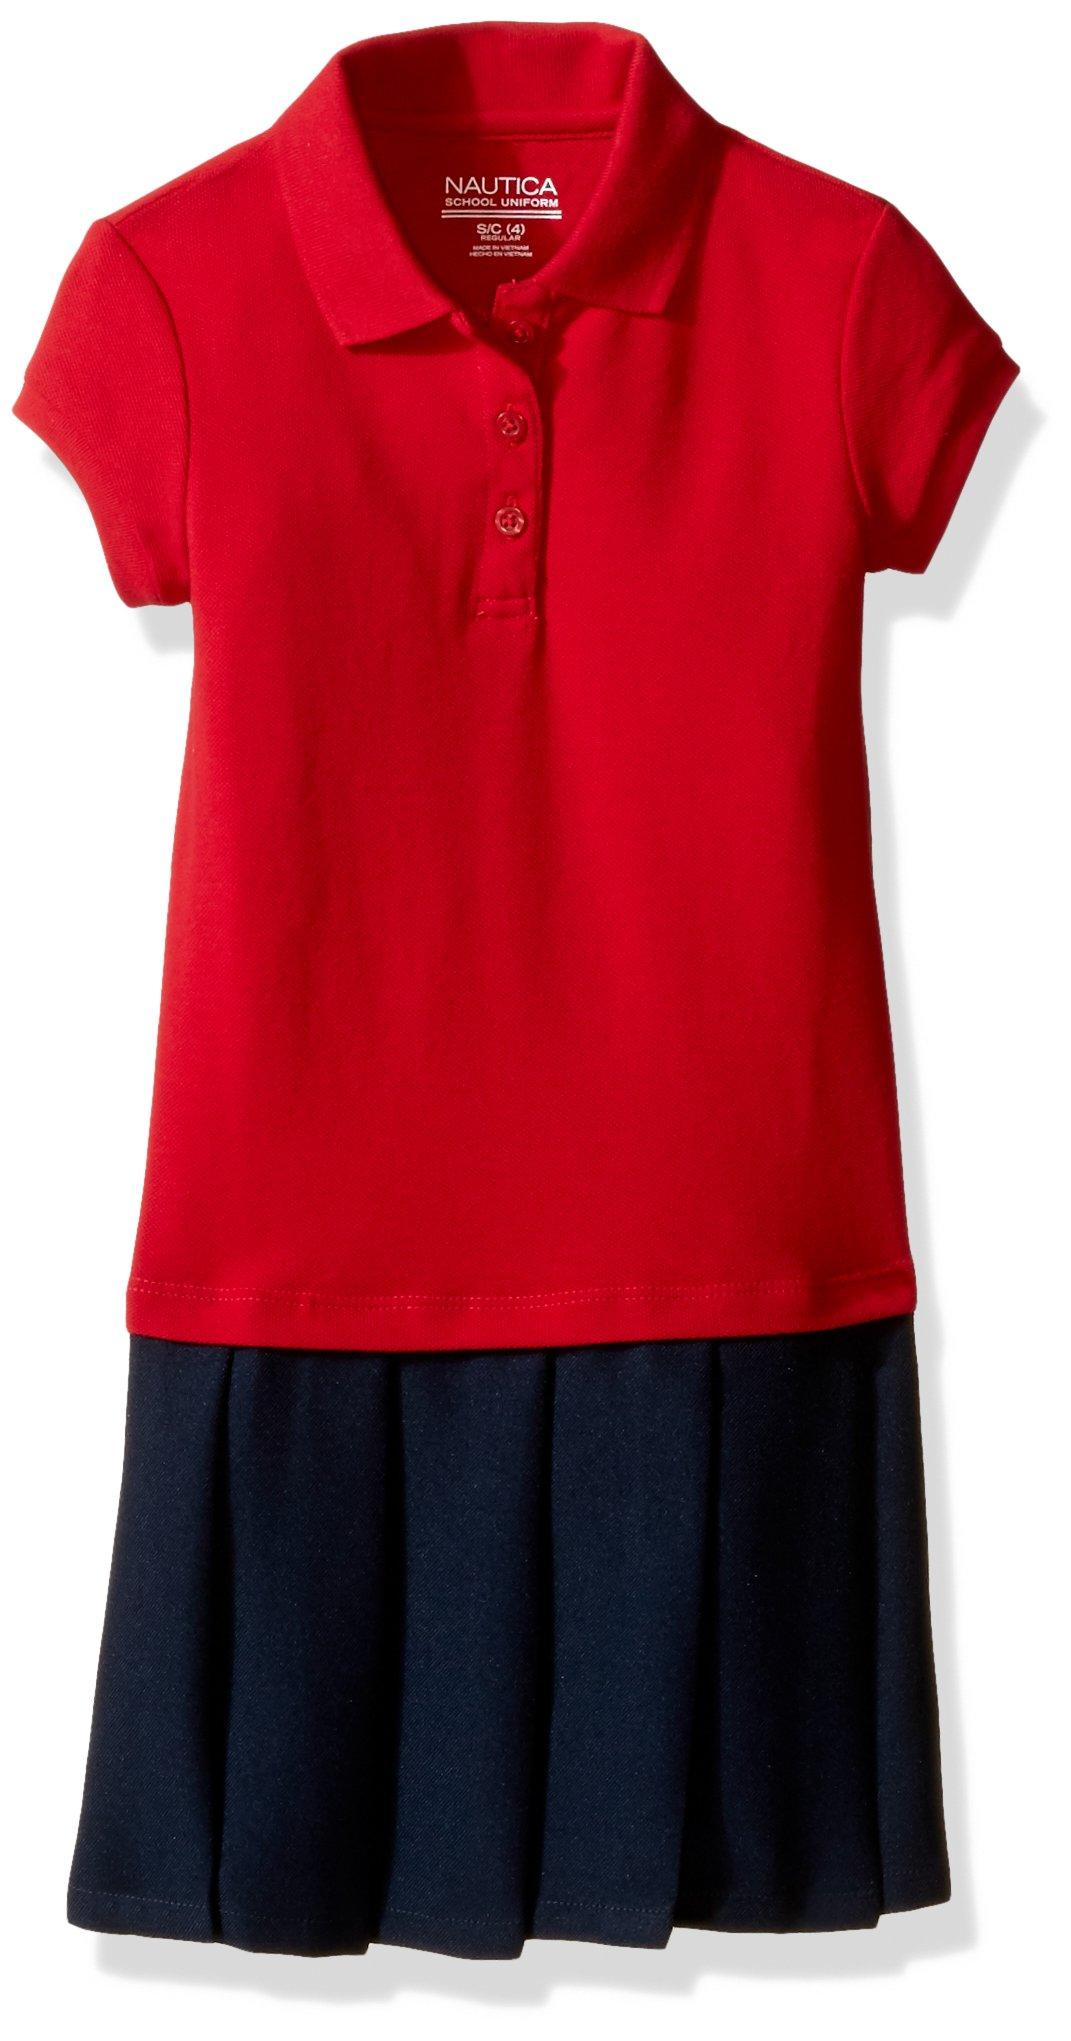 Nautica Little Girls' Uniform Pique Polo Pleated Dress, Red, 6